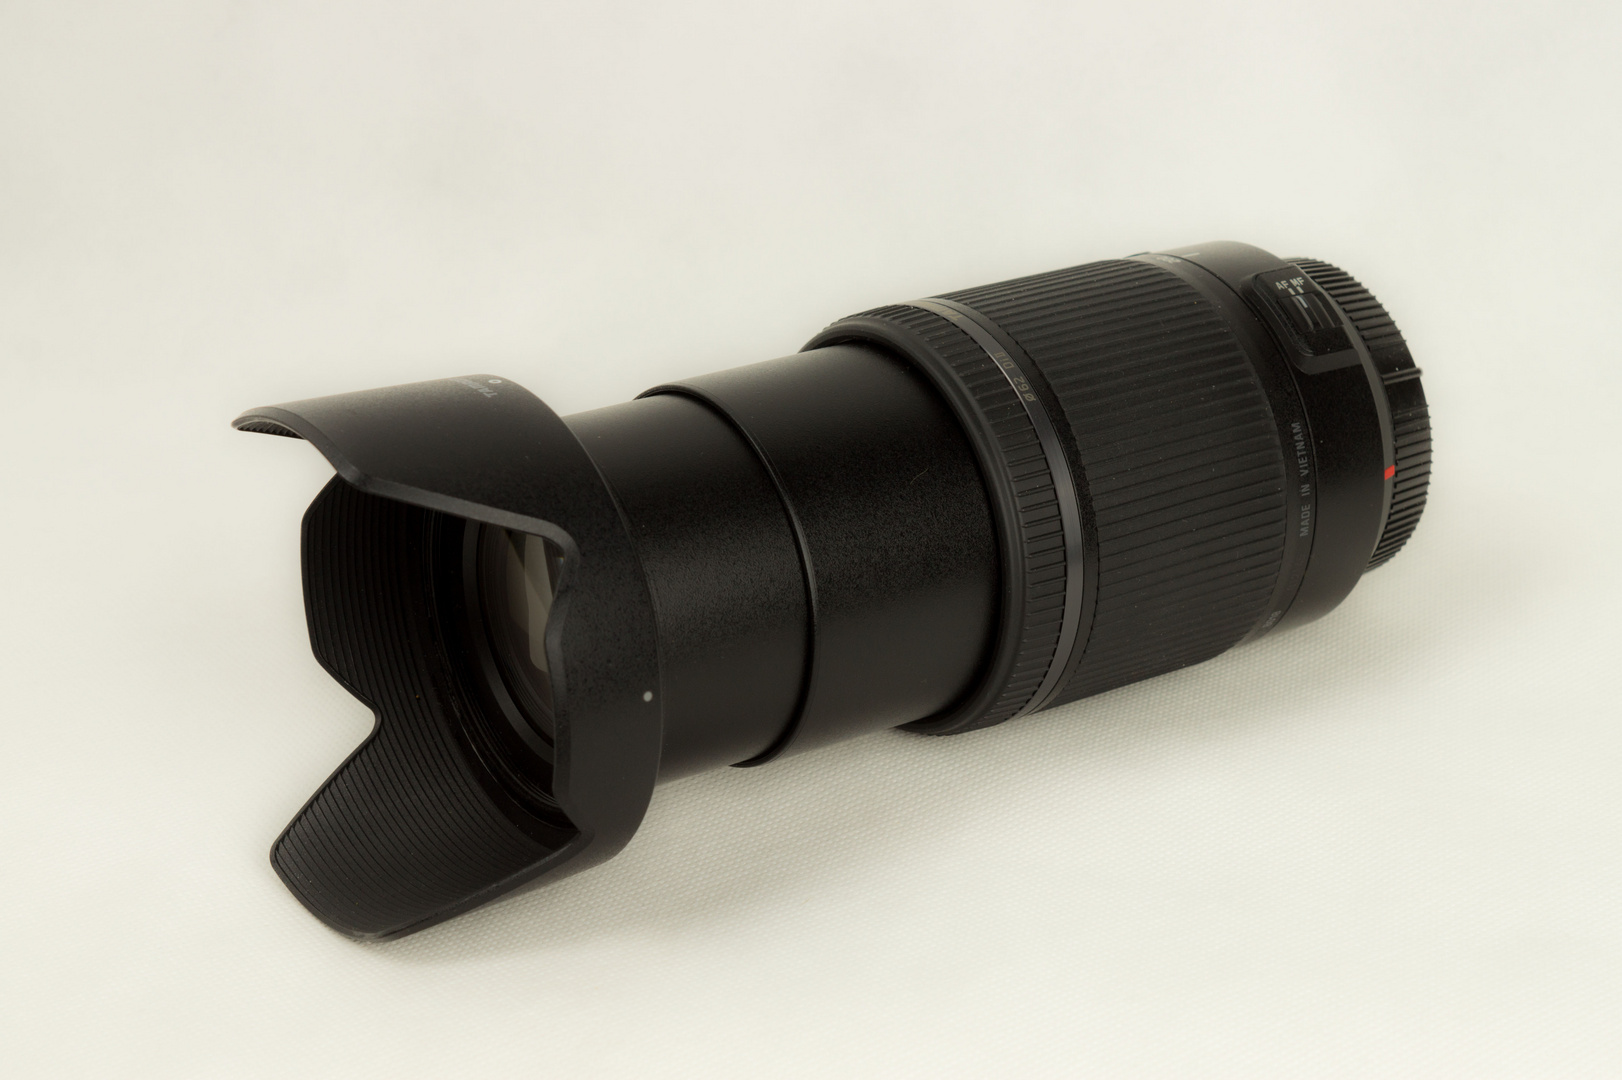 Tamron Reiseobjektiv 18-200mm